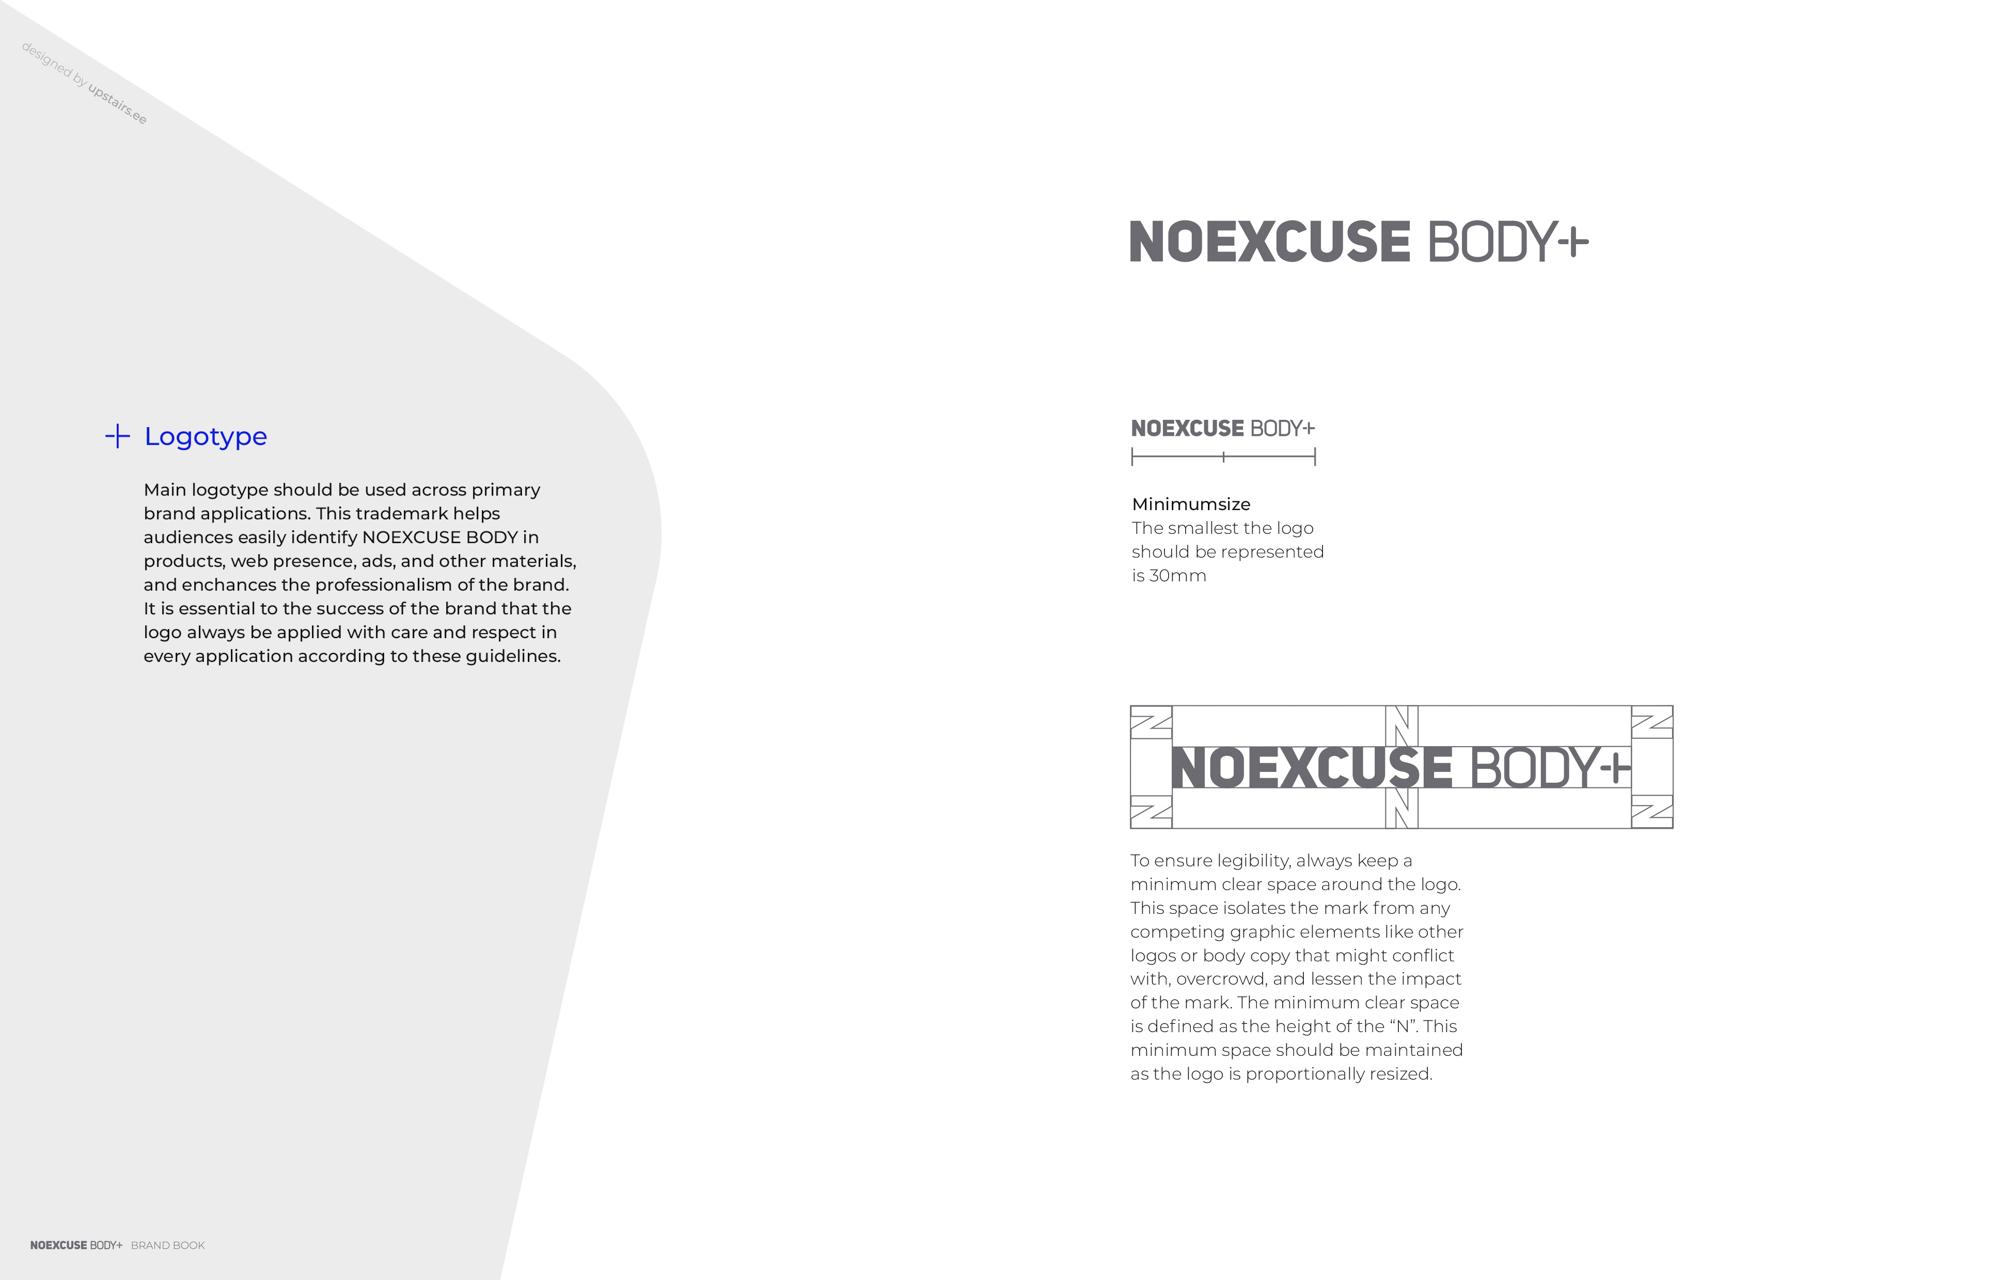 noexcuse body brand.cdr